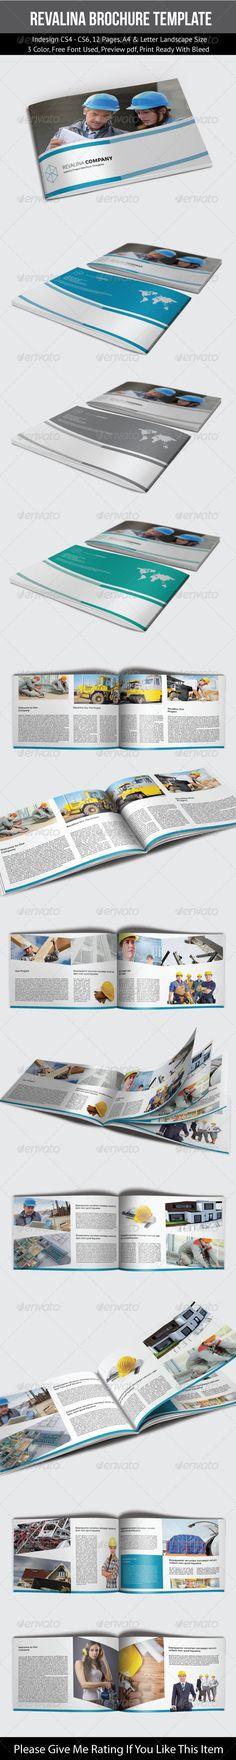 HR Handbook or Manual Employee handbook, Print templates and